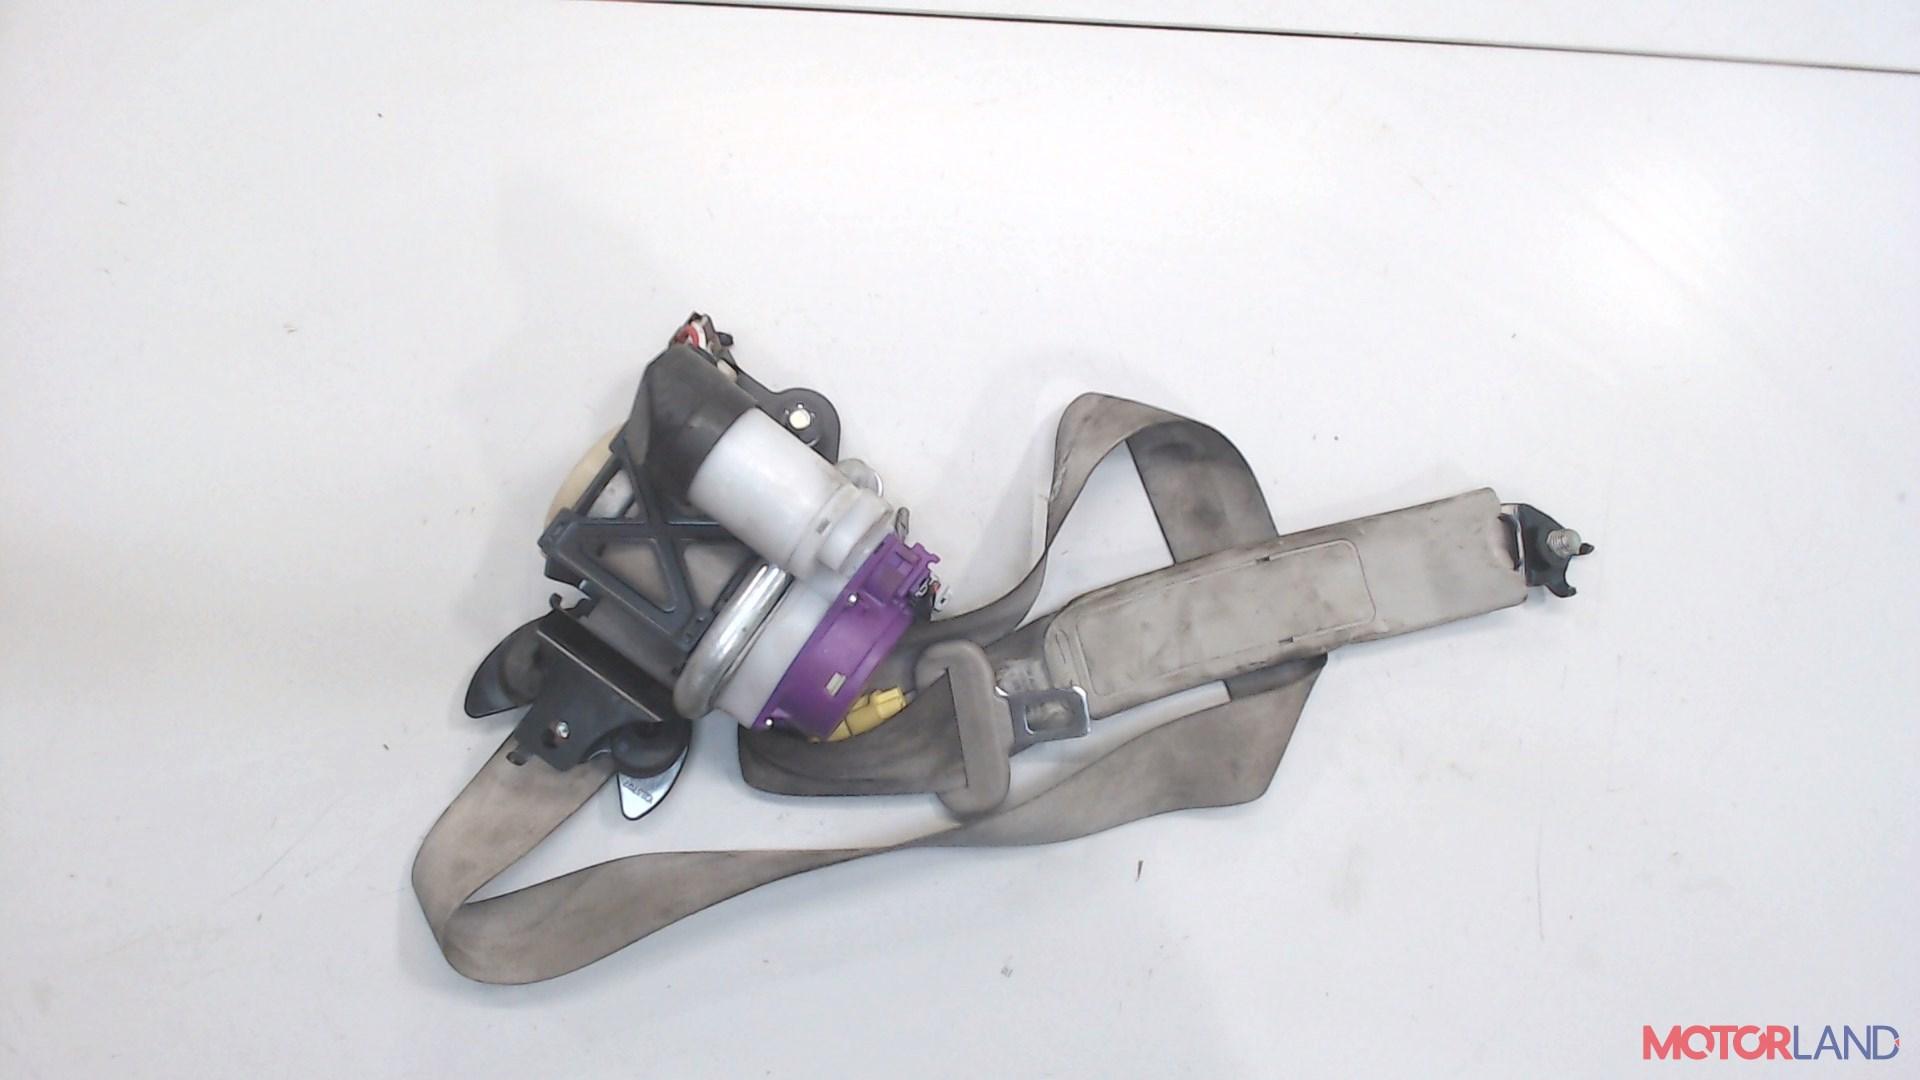 Ремень безопасности Acura RL 2004-2012, Артикул 5477741 #1